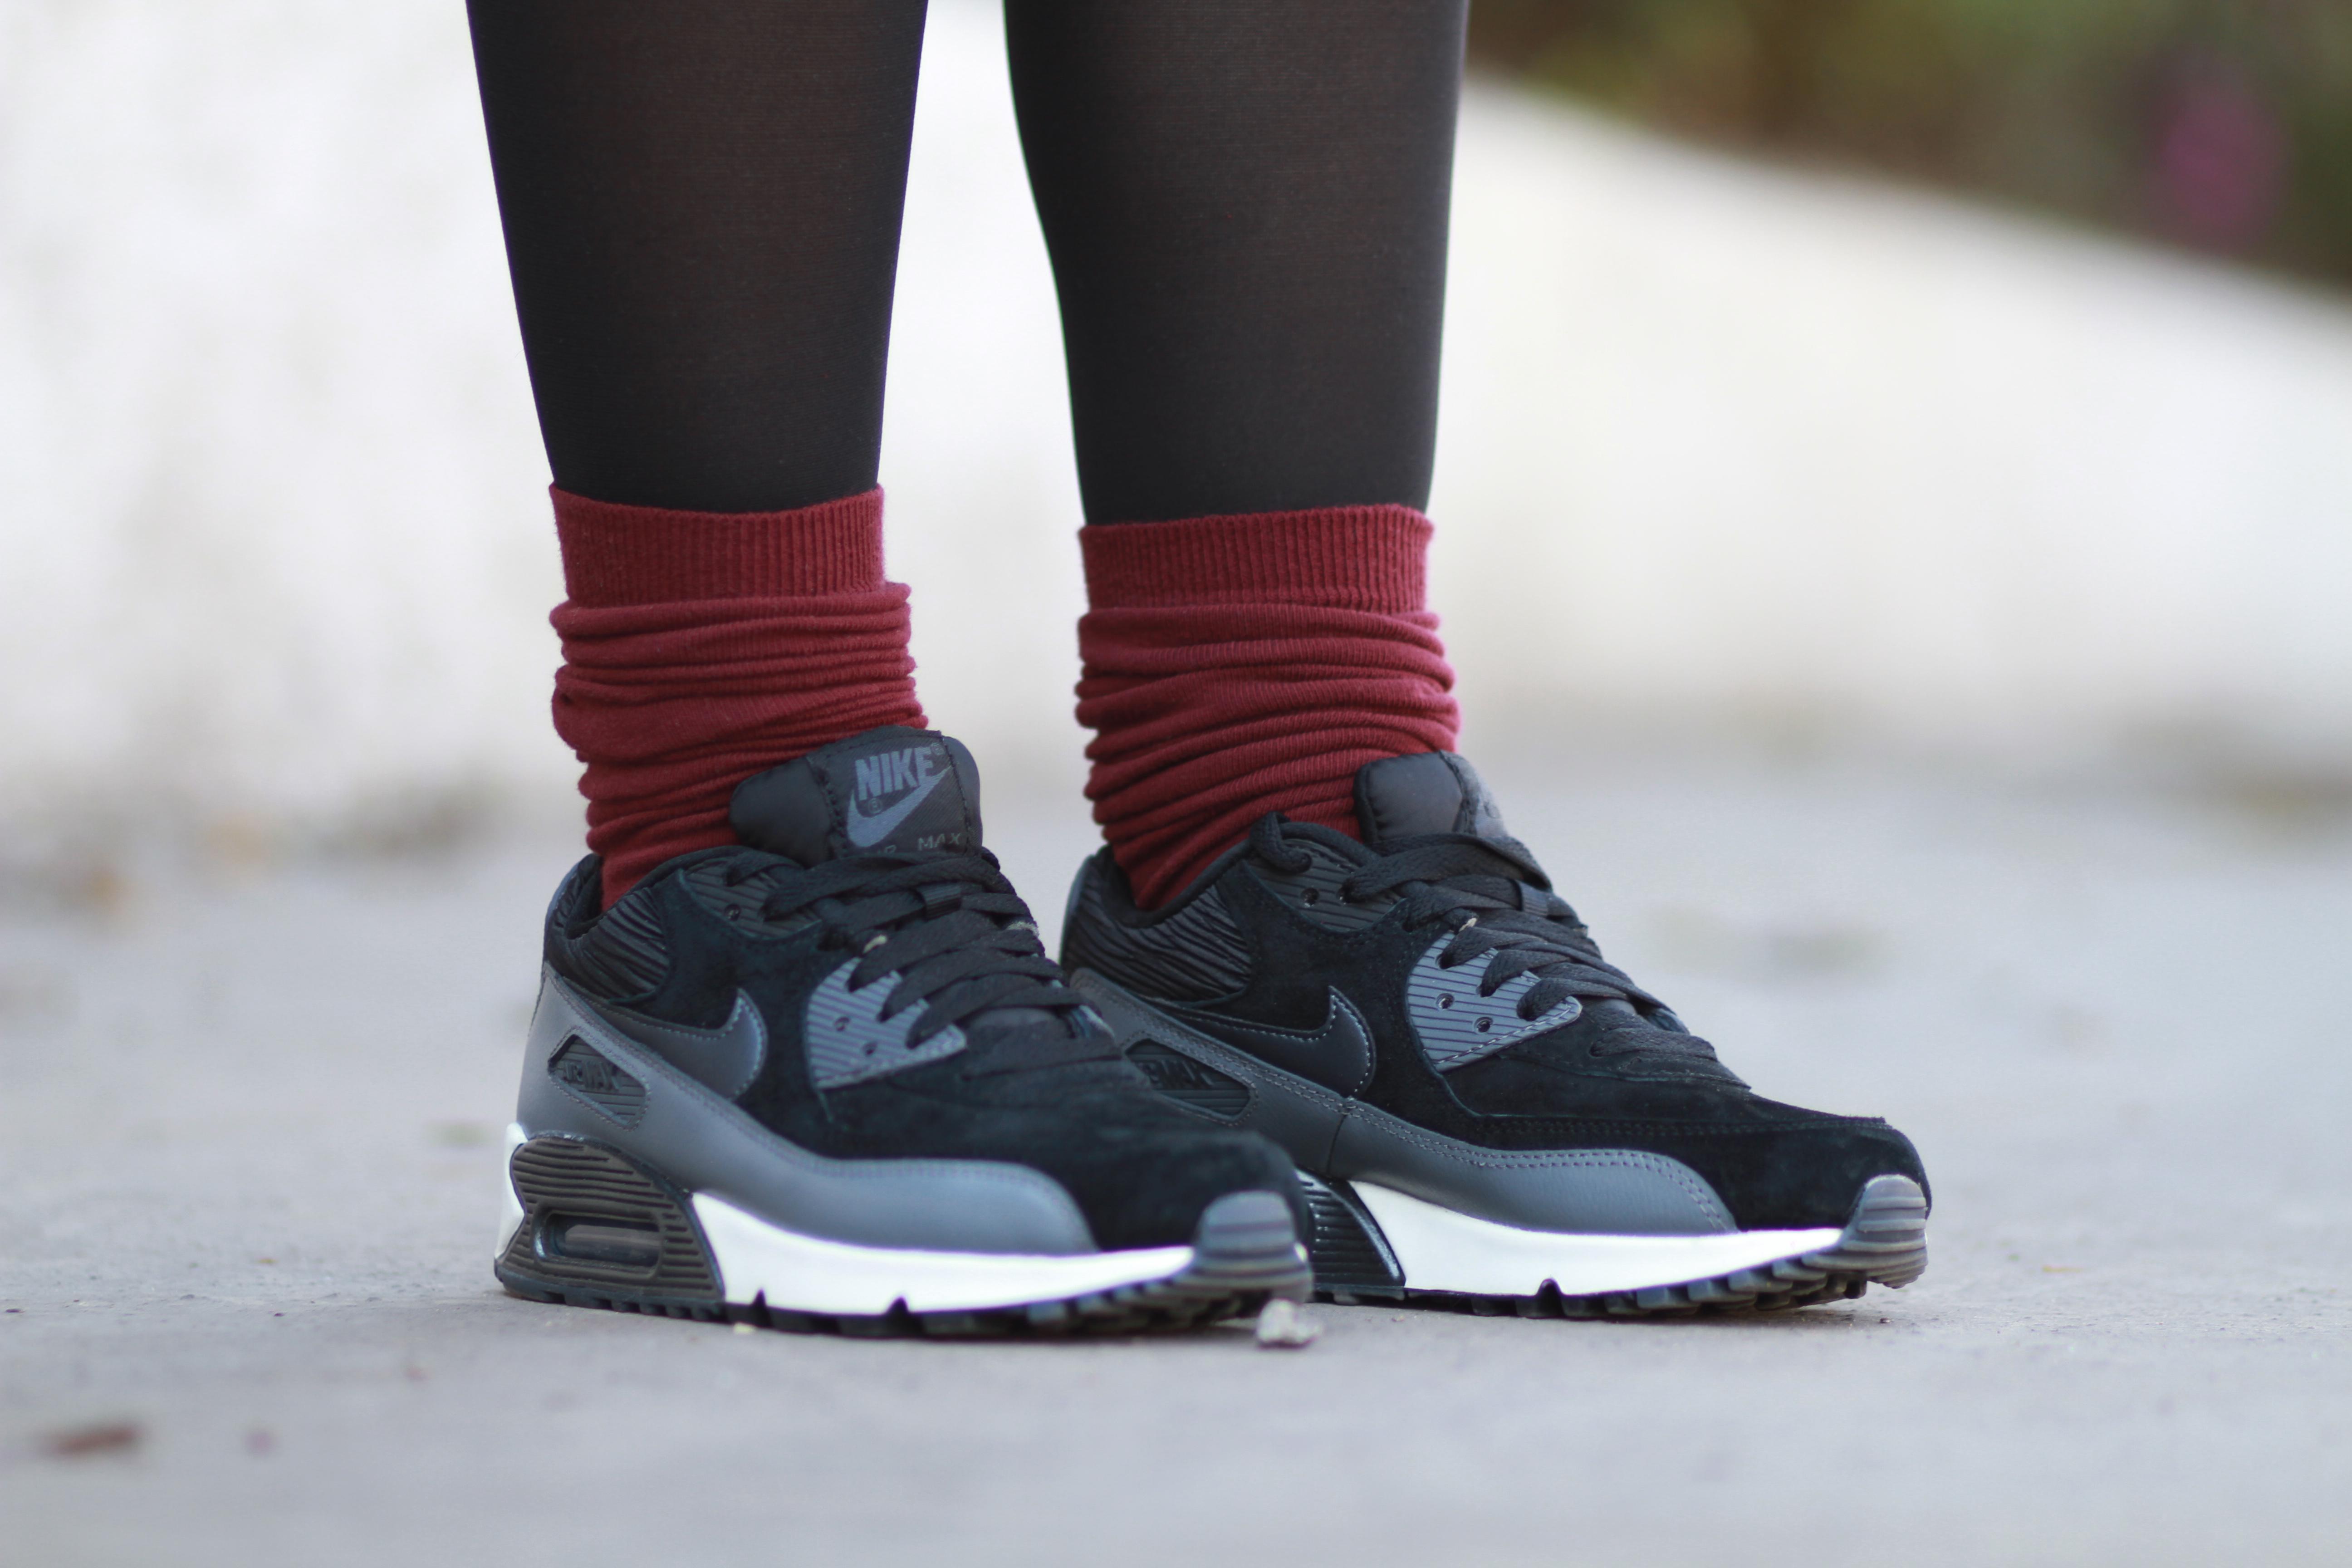 Sportswear-chic-blog-mode-chiccarpediem-5